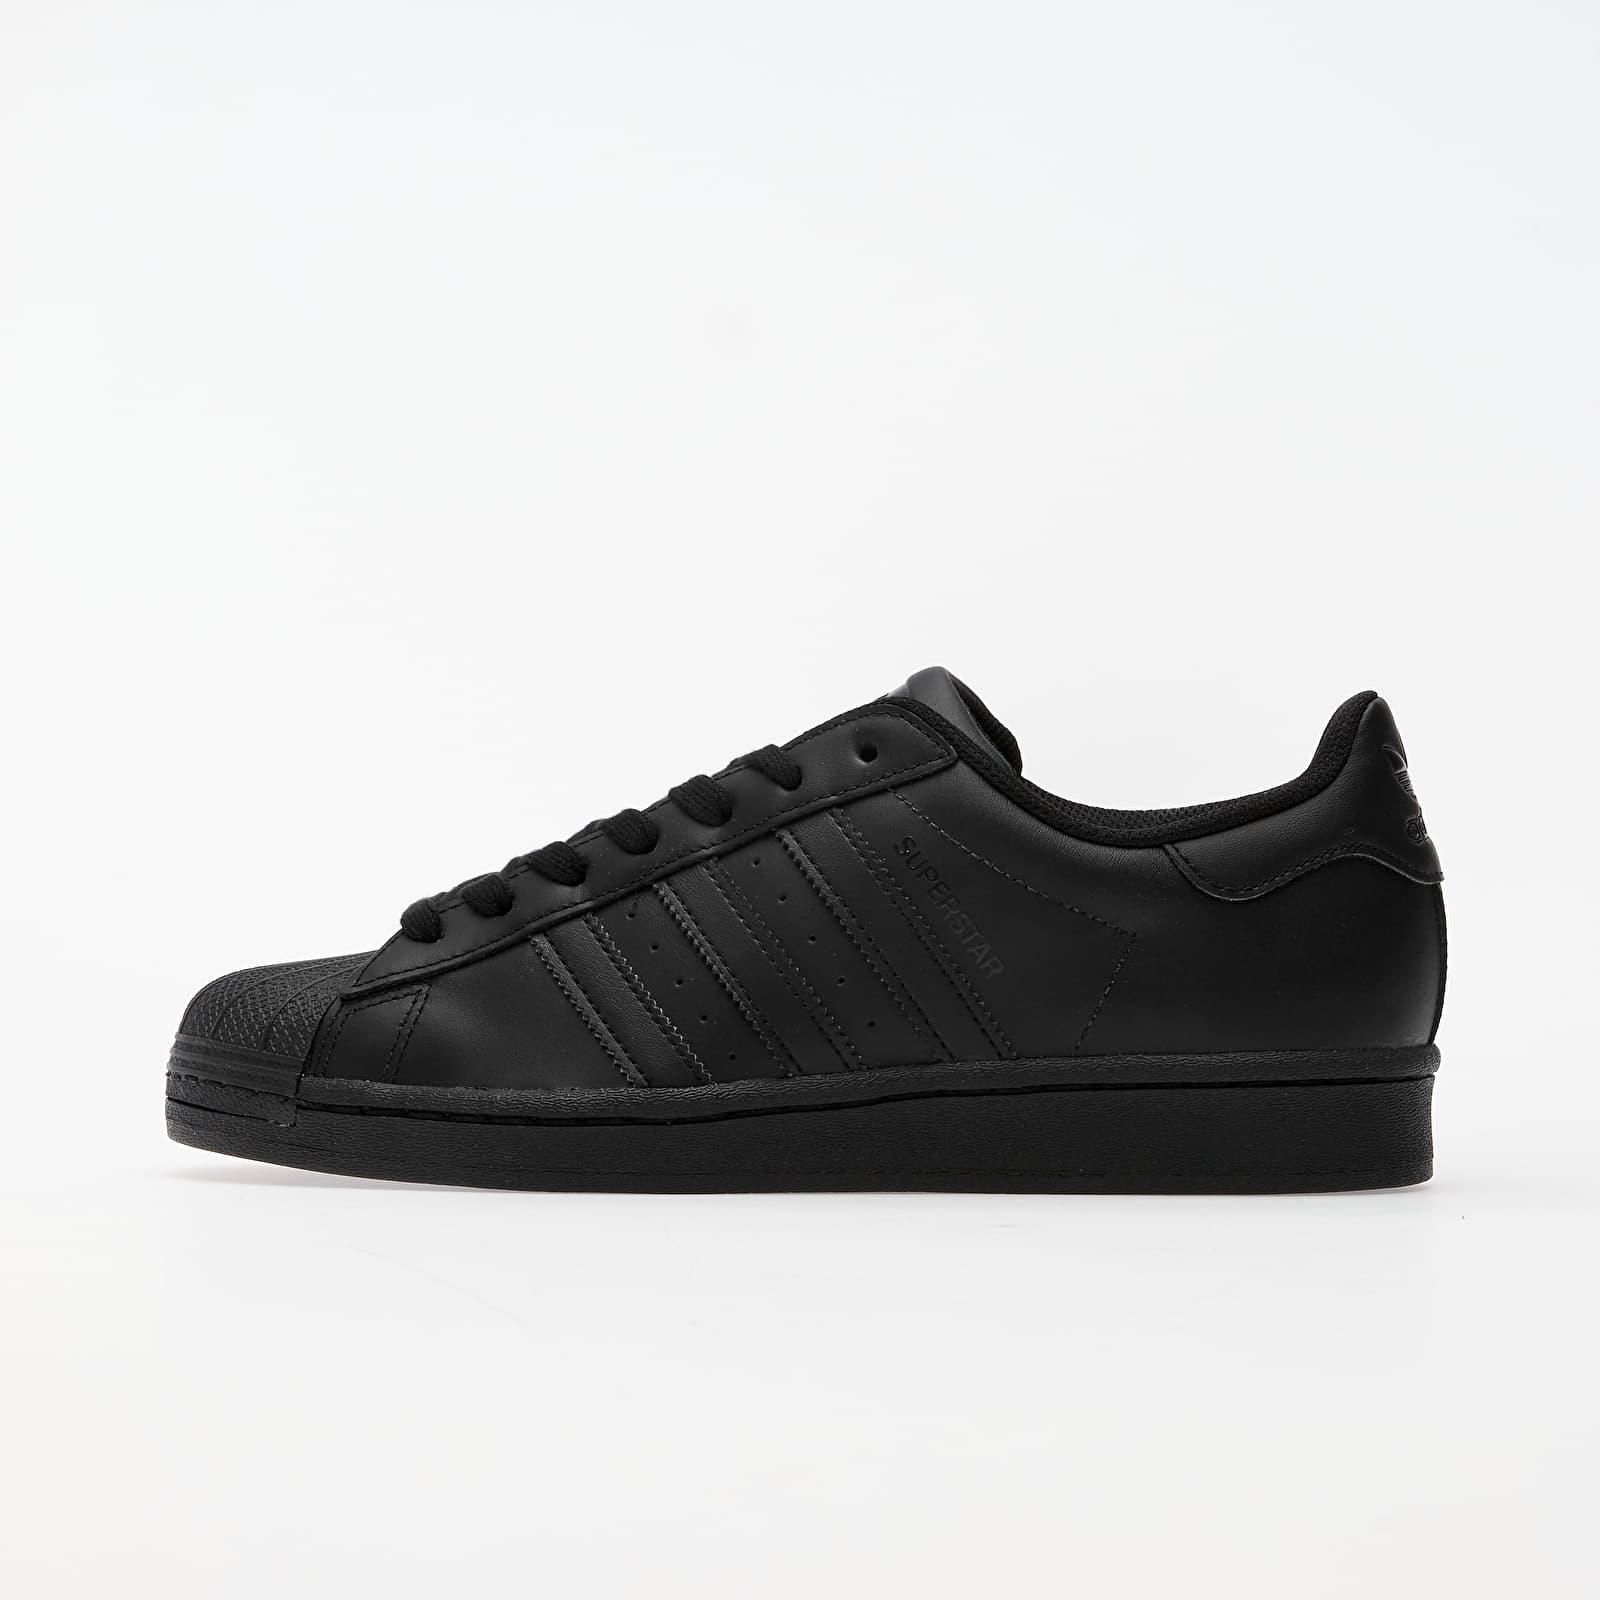 Pánske tenisky a topánky adidas Superstar Core Black/ Core Black/ Core Black